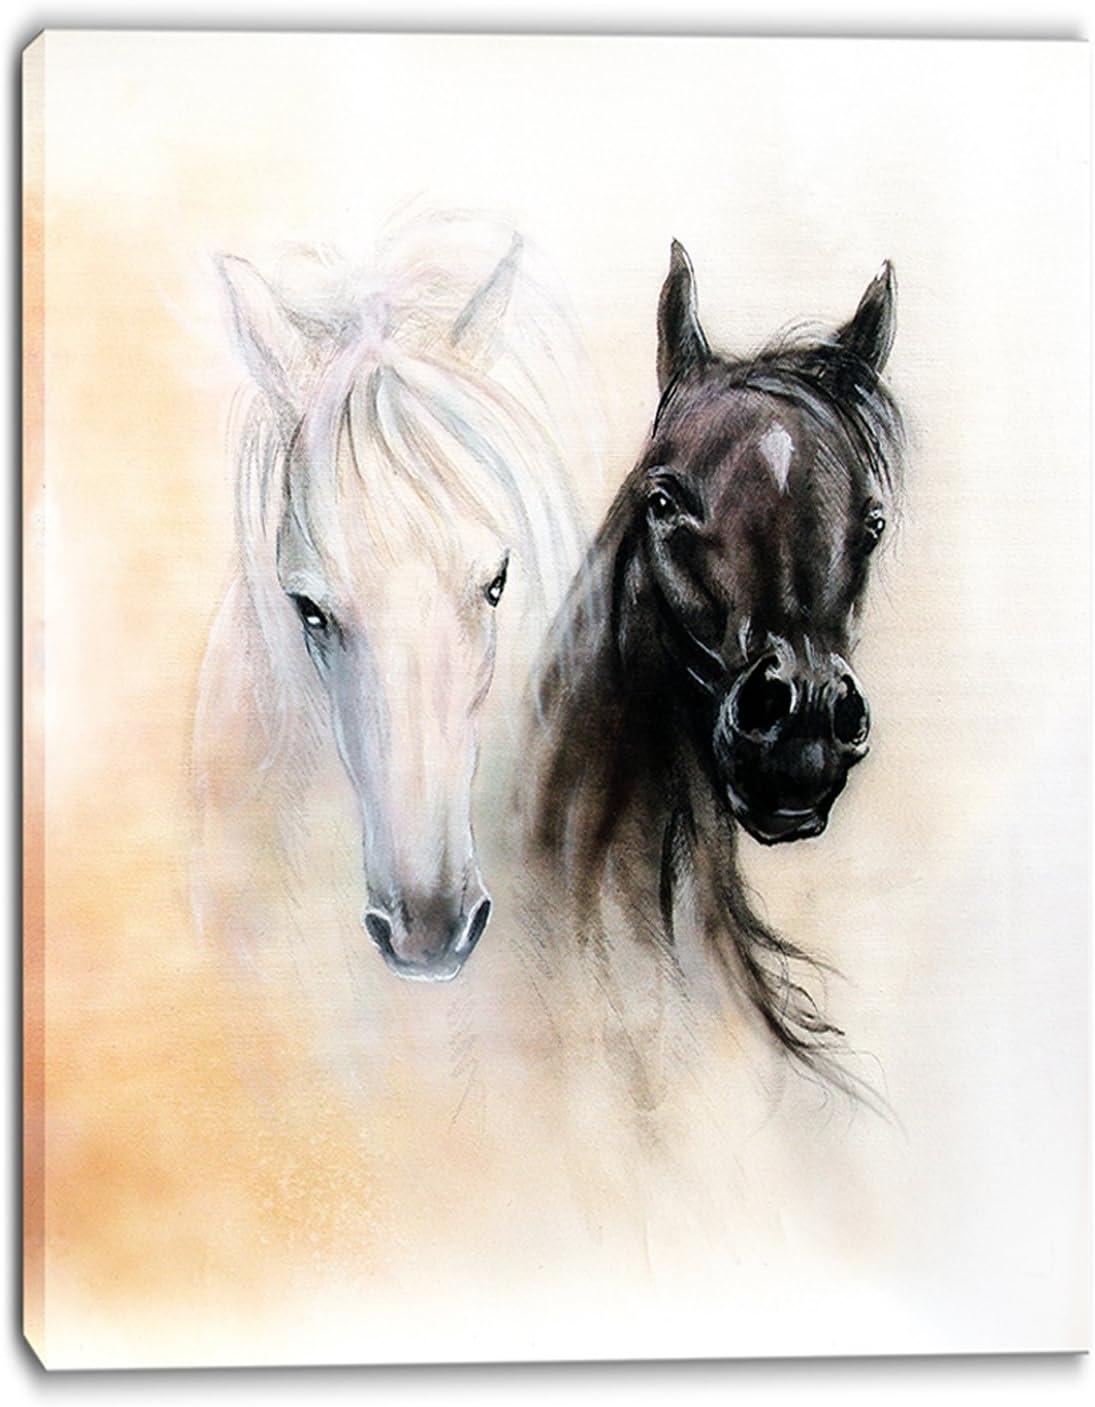 Design お歳暮 Art PT6280-12-20 Black and White Canva Heads-Animal Horse 毎日続々入荷